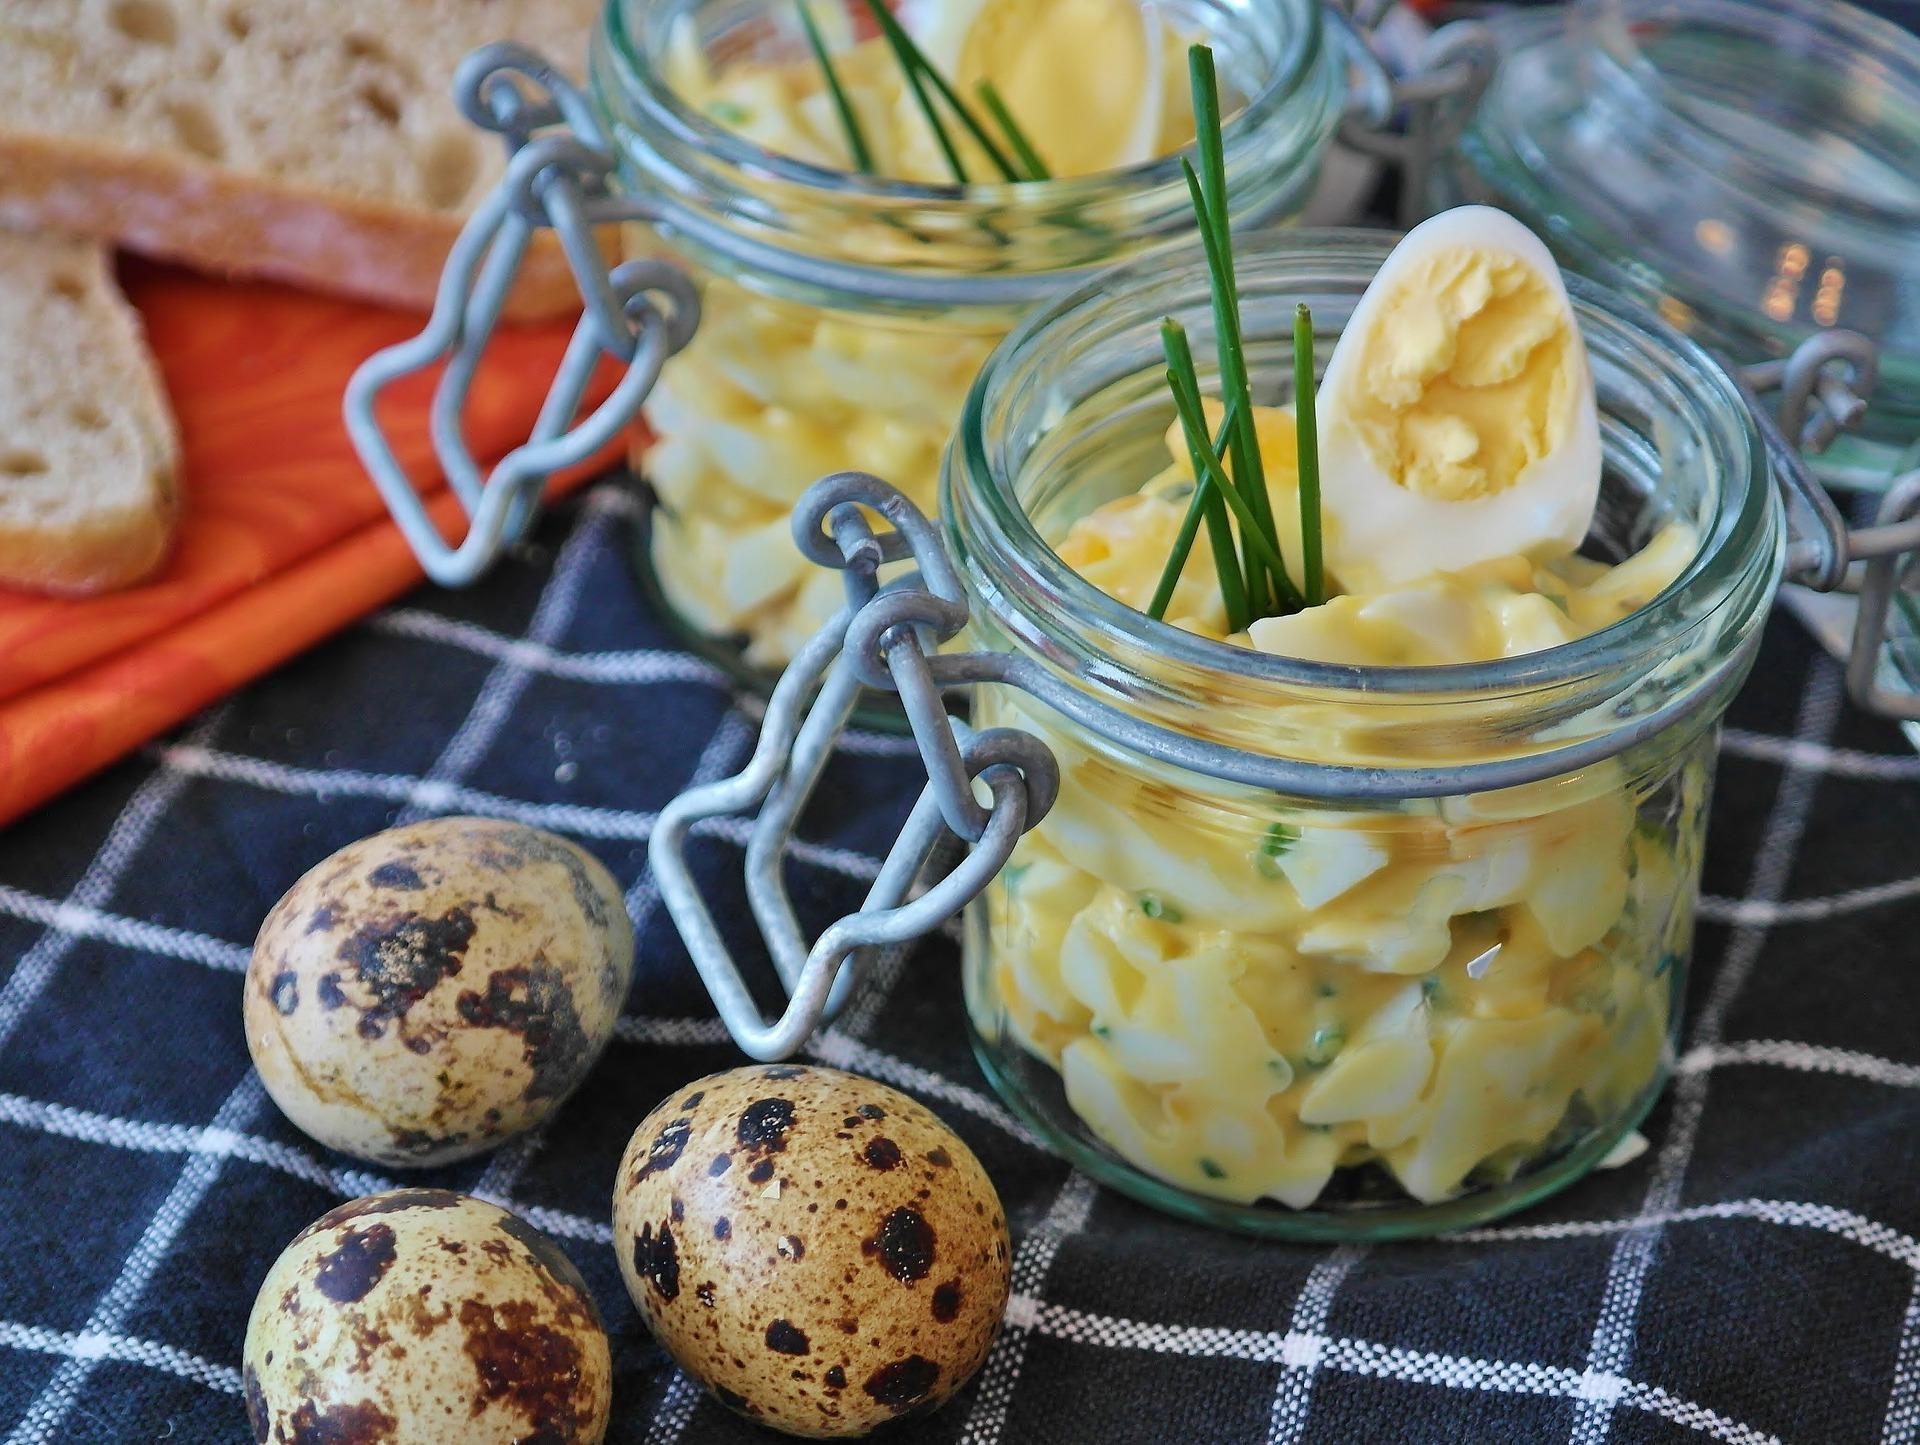 egg-salad-3290722_1920.jpg